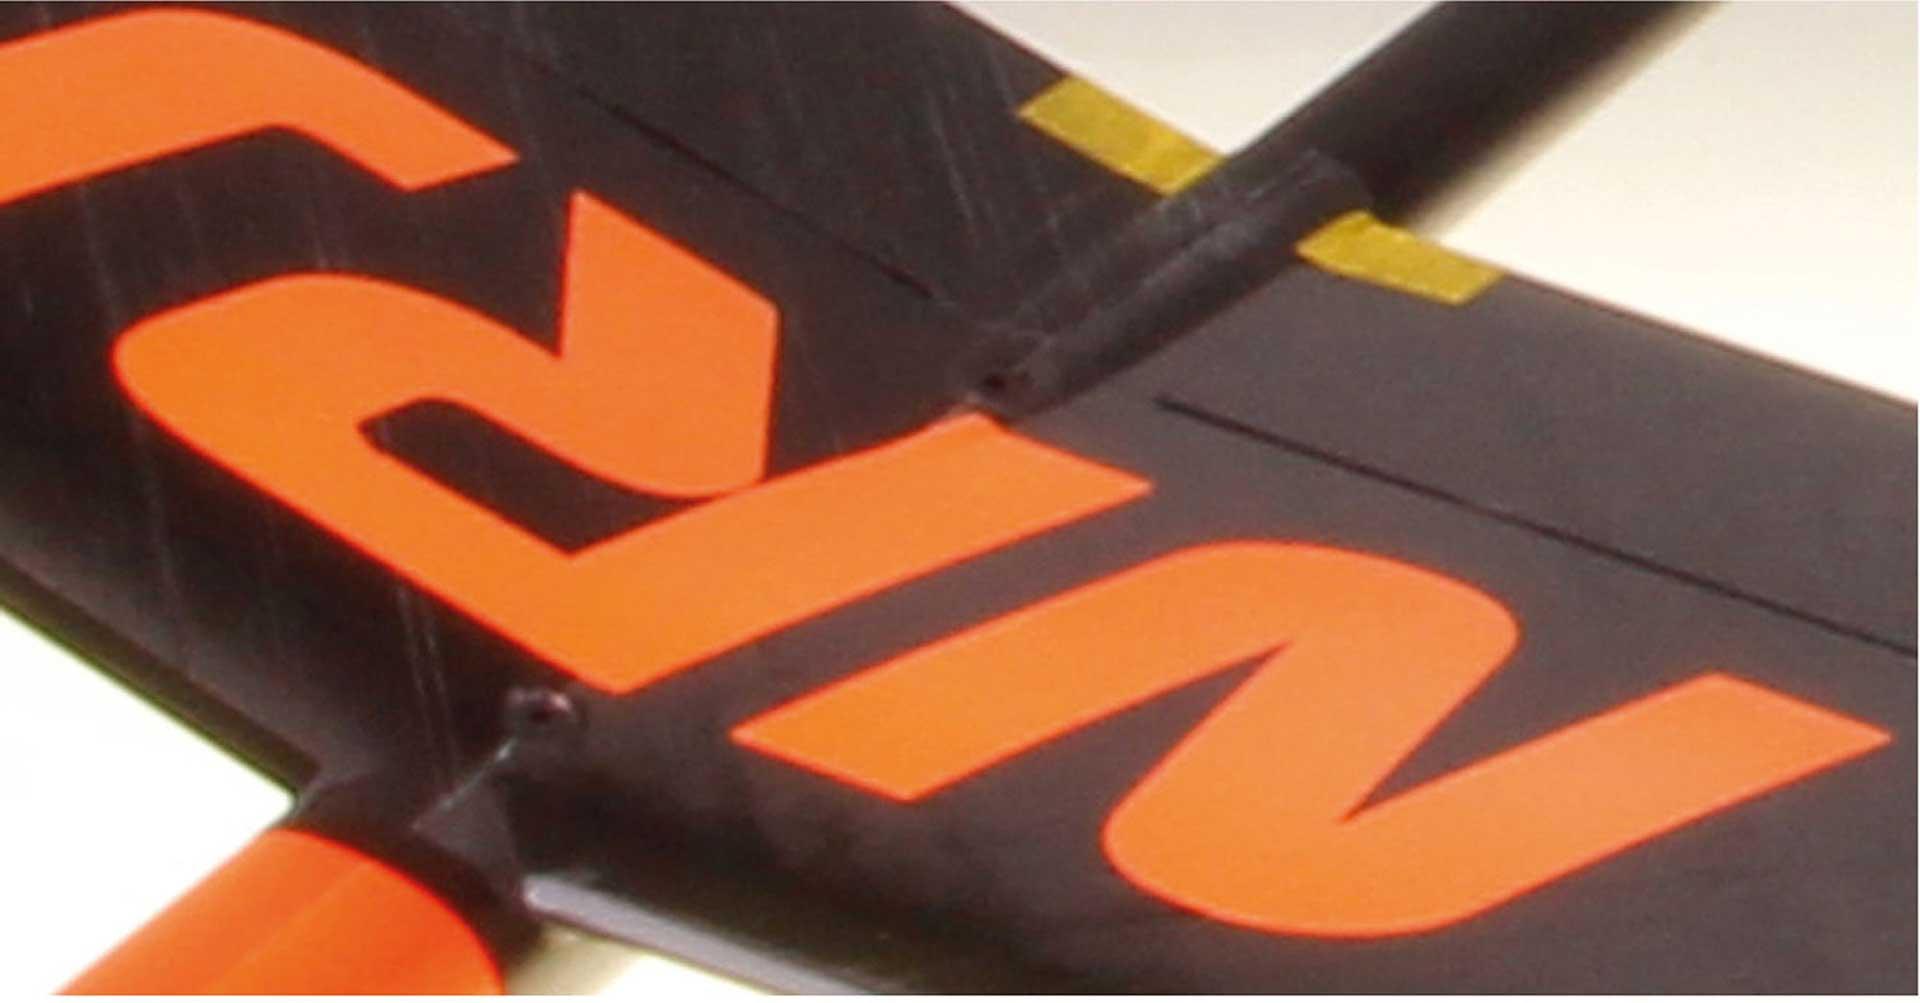 OA-COMPOSITES NRJ F3K ORANGE # 18 CW40 SPIN GLIDER